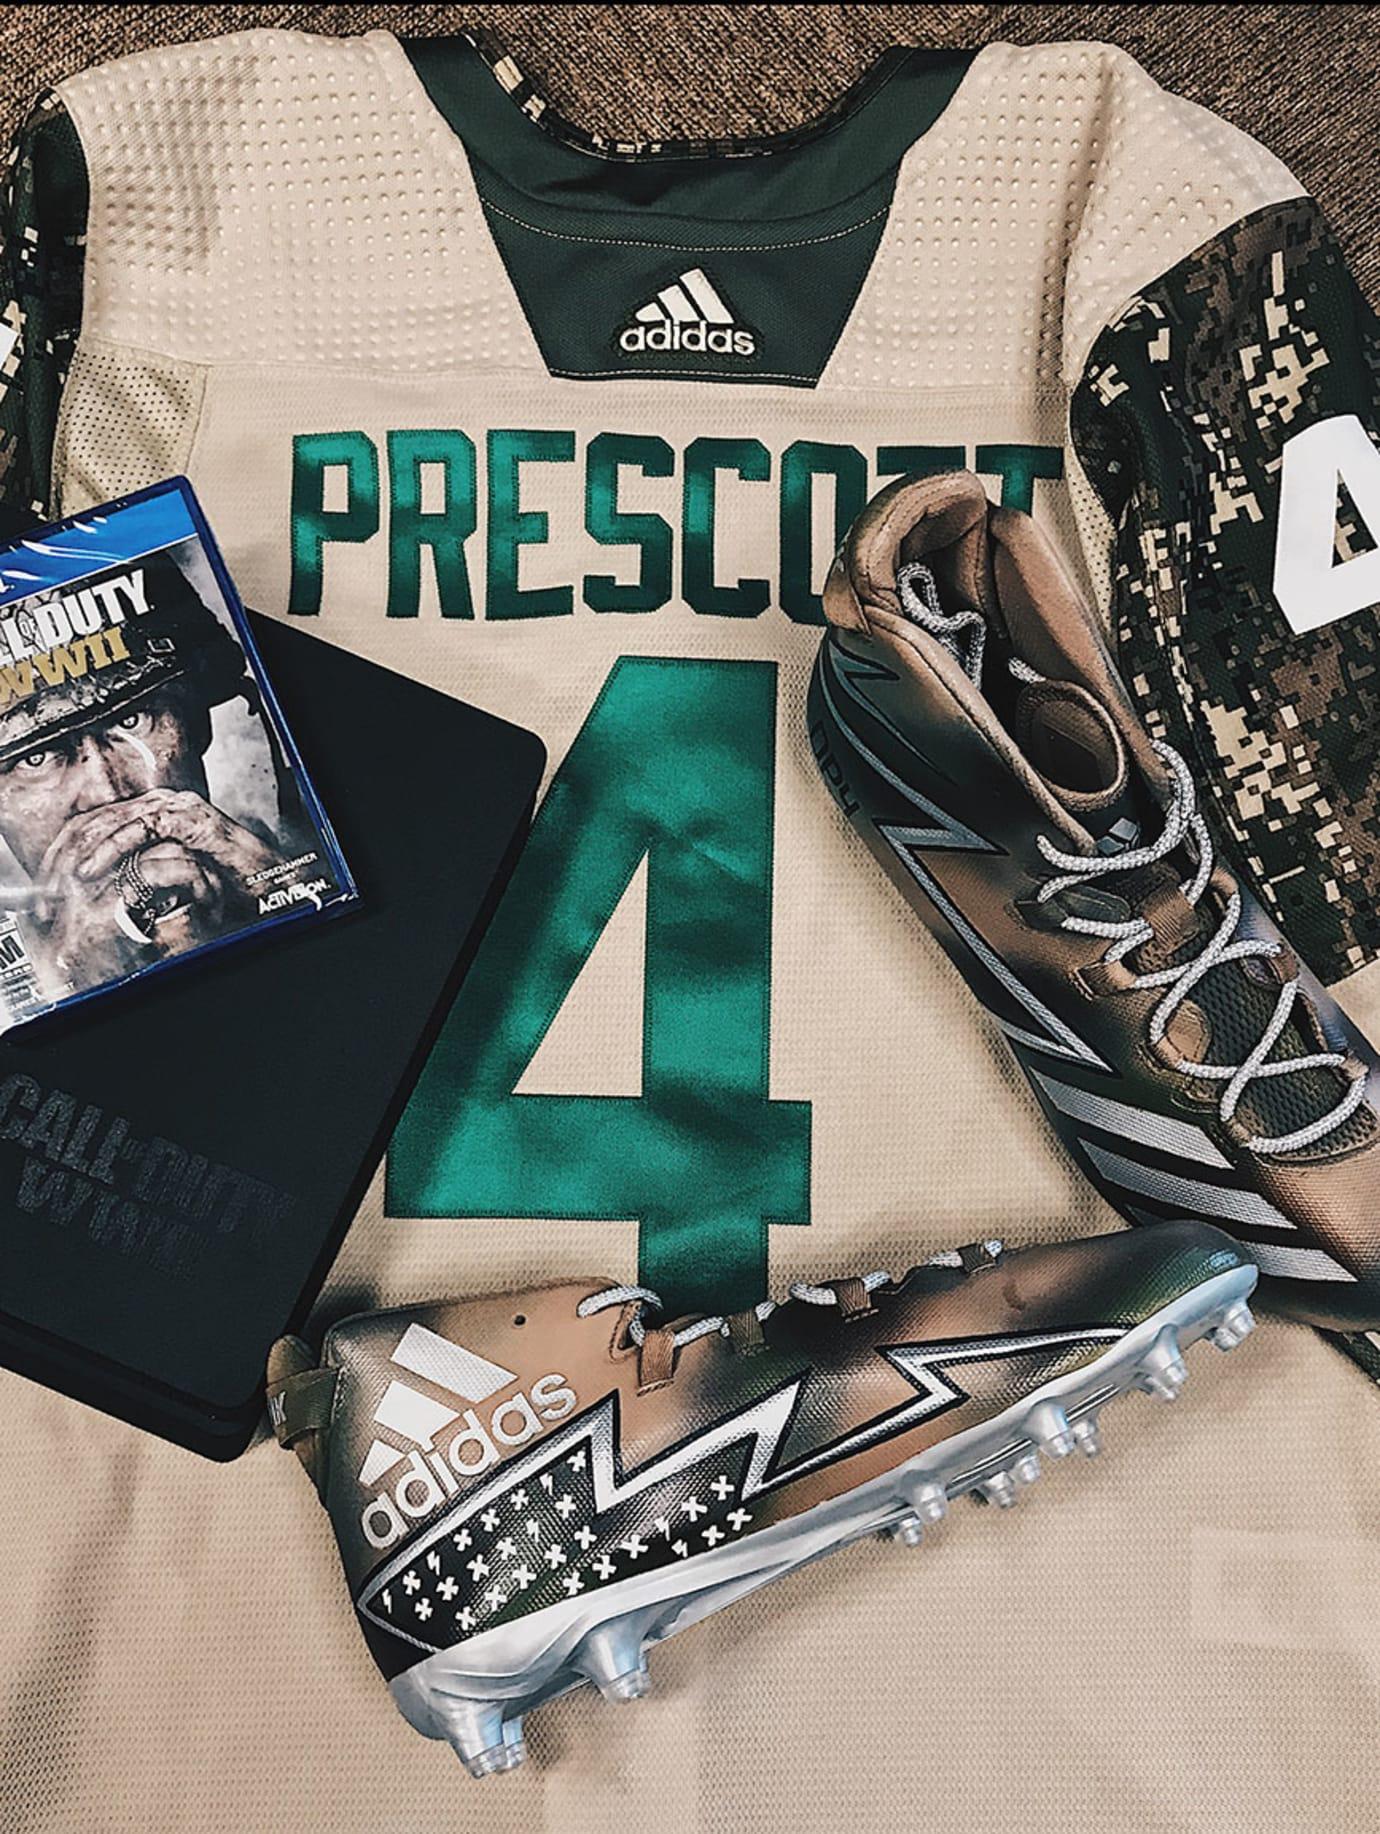 Adidas Call of Duty Cleats Dak Prescott